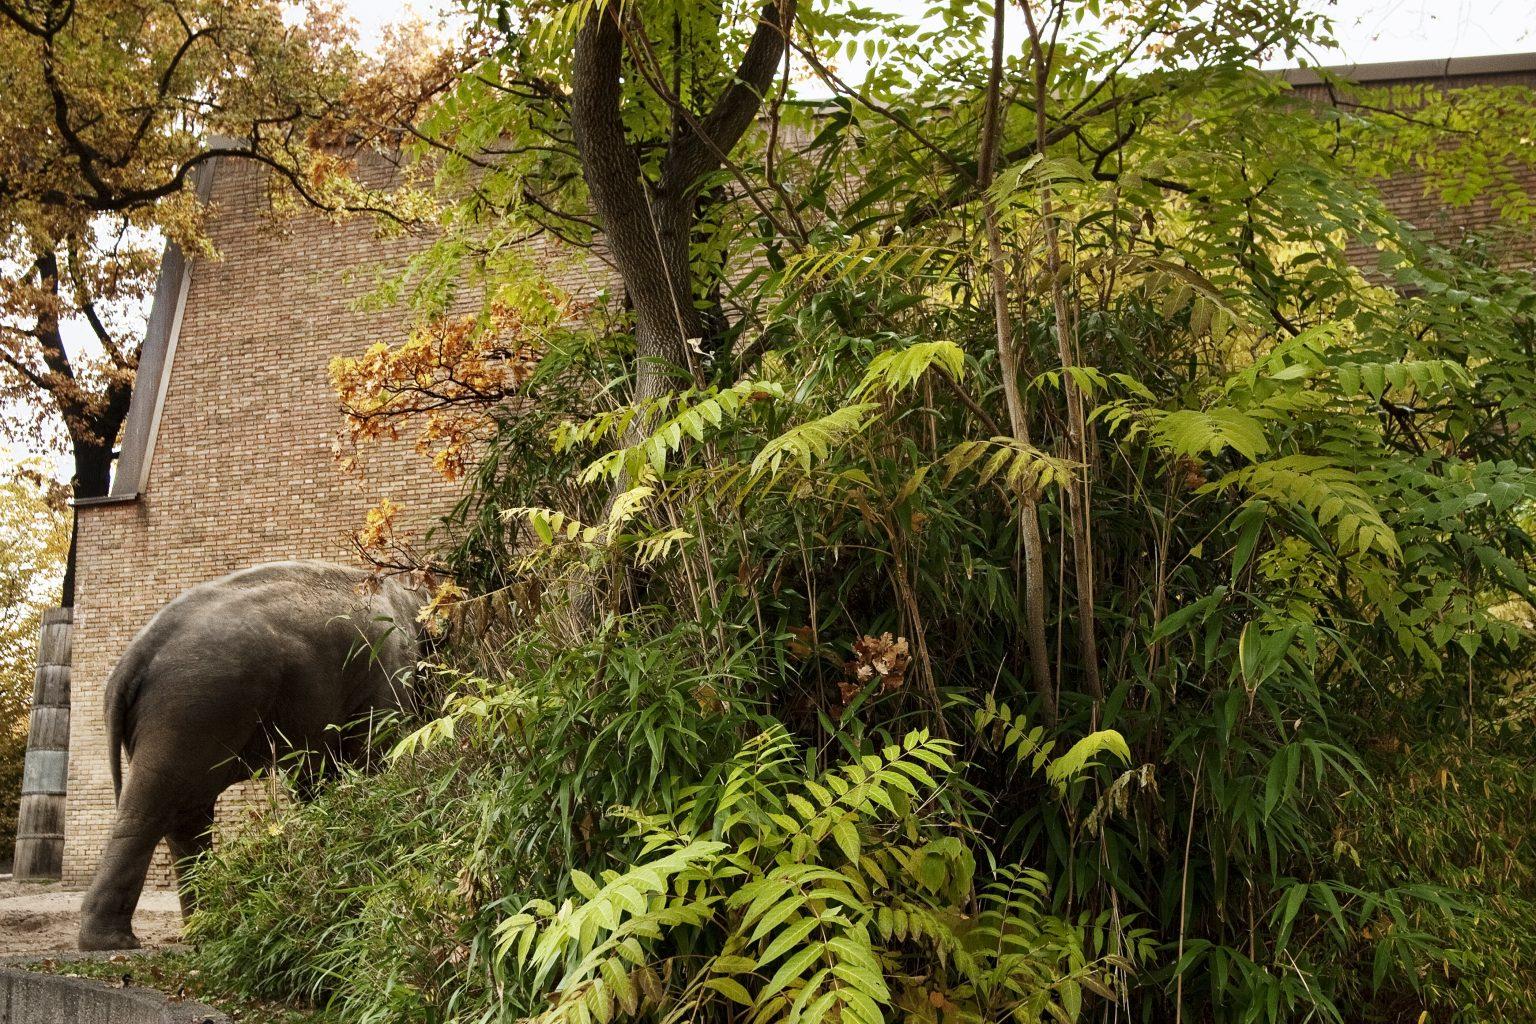 Berlin, October 2010 - zoological garden, Asian elephant. >< Berlino, ottobre 2010 - giardino zoologico, elefante asiatico.